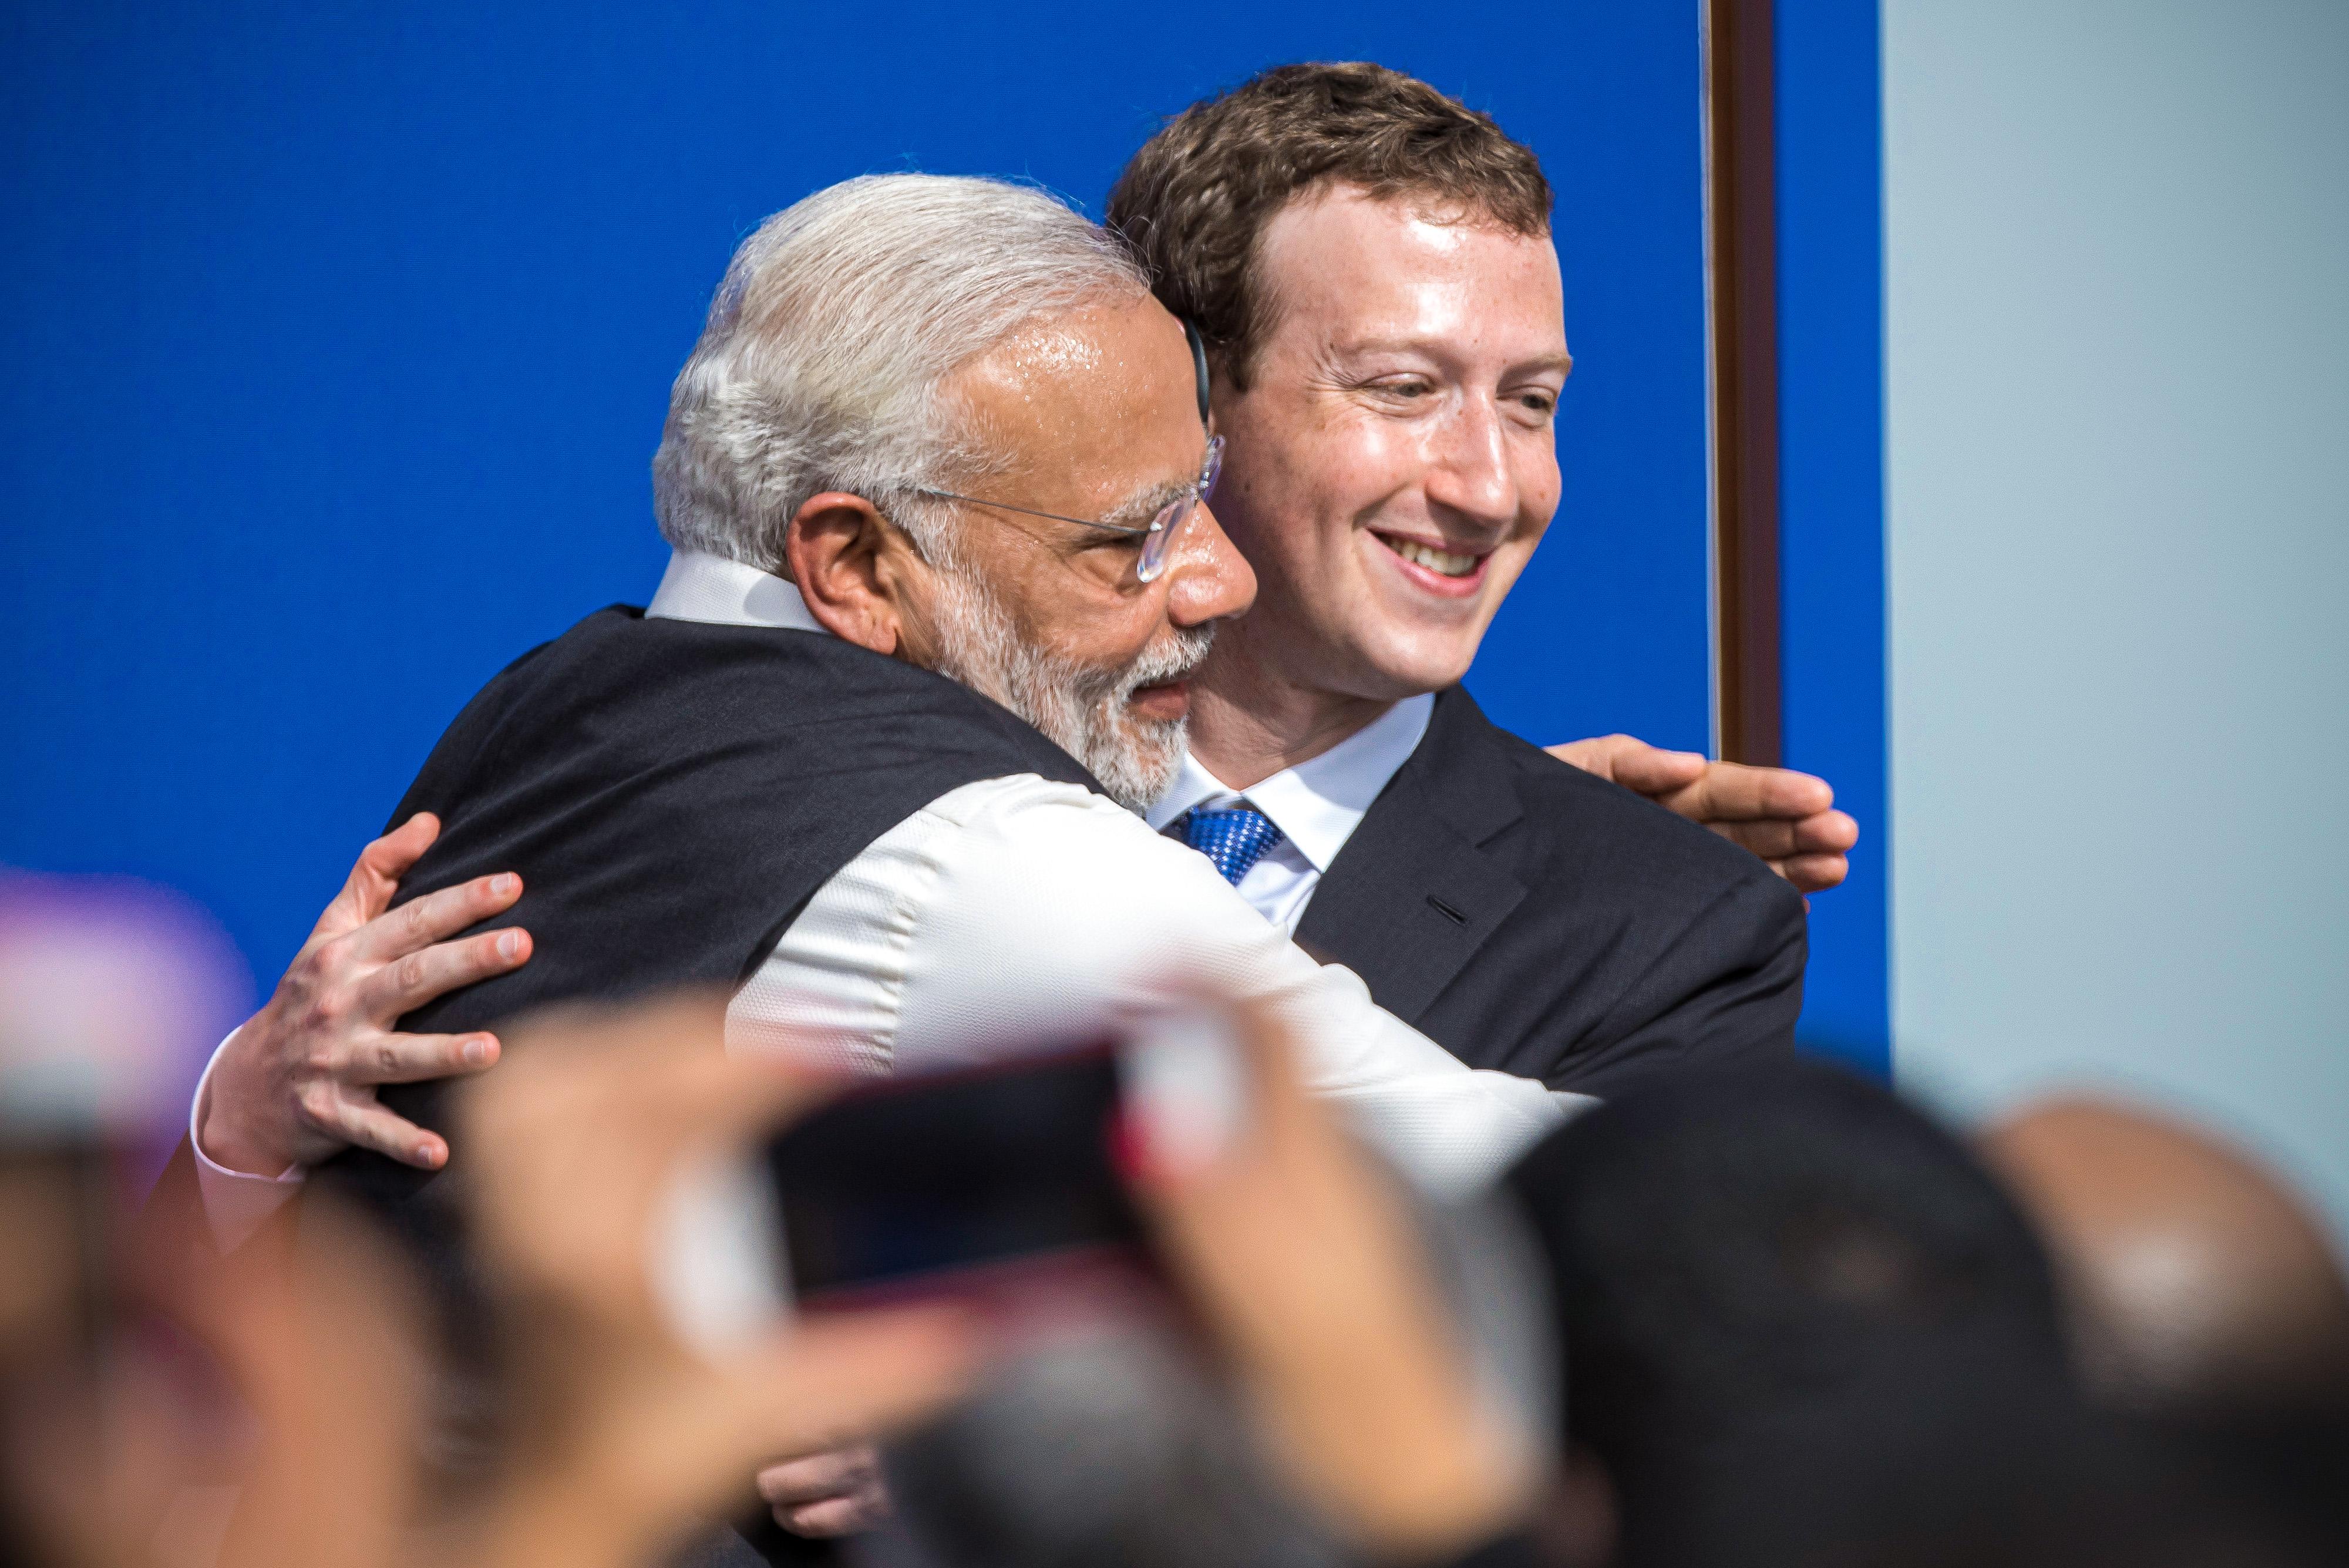 Indian Prime Minister Narendra Modi, left, and Facebook CEO Mark Zuckerberg, right, hugging